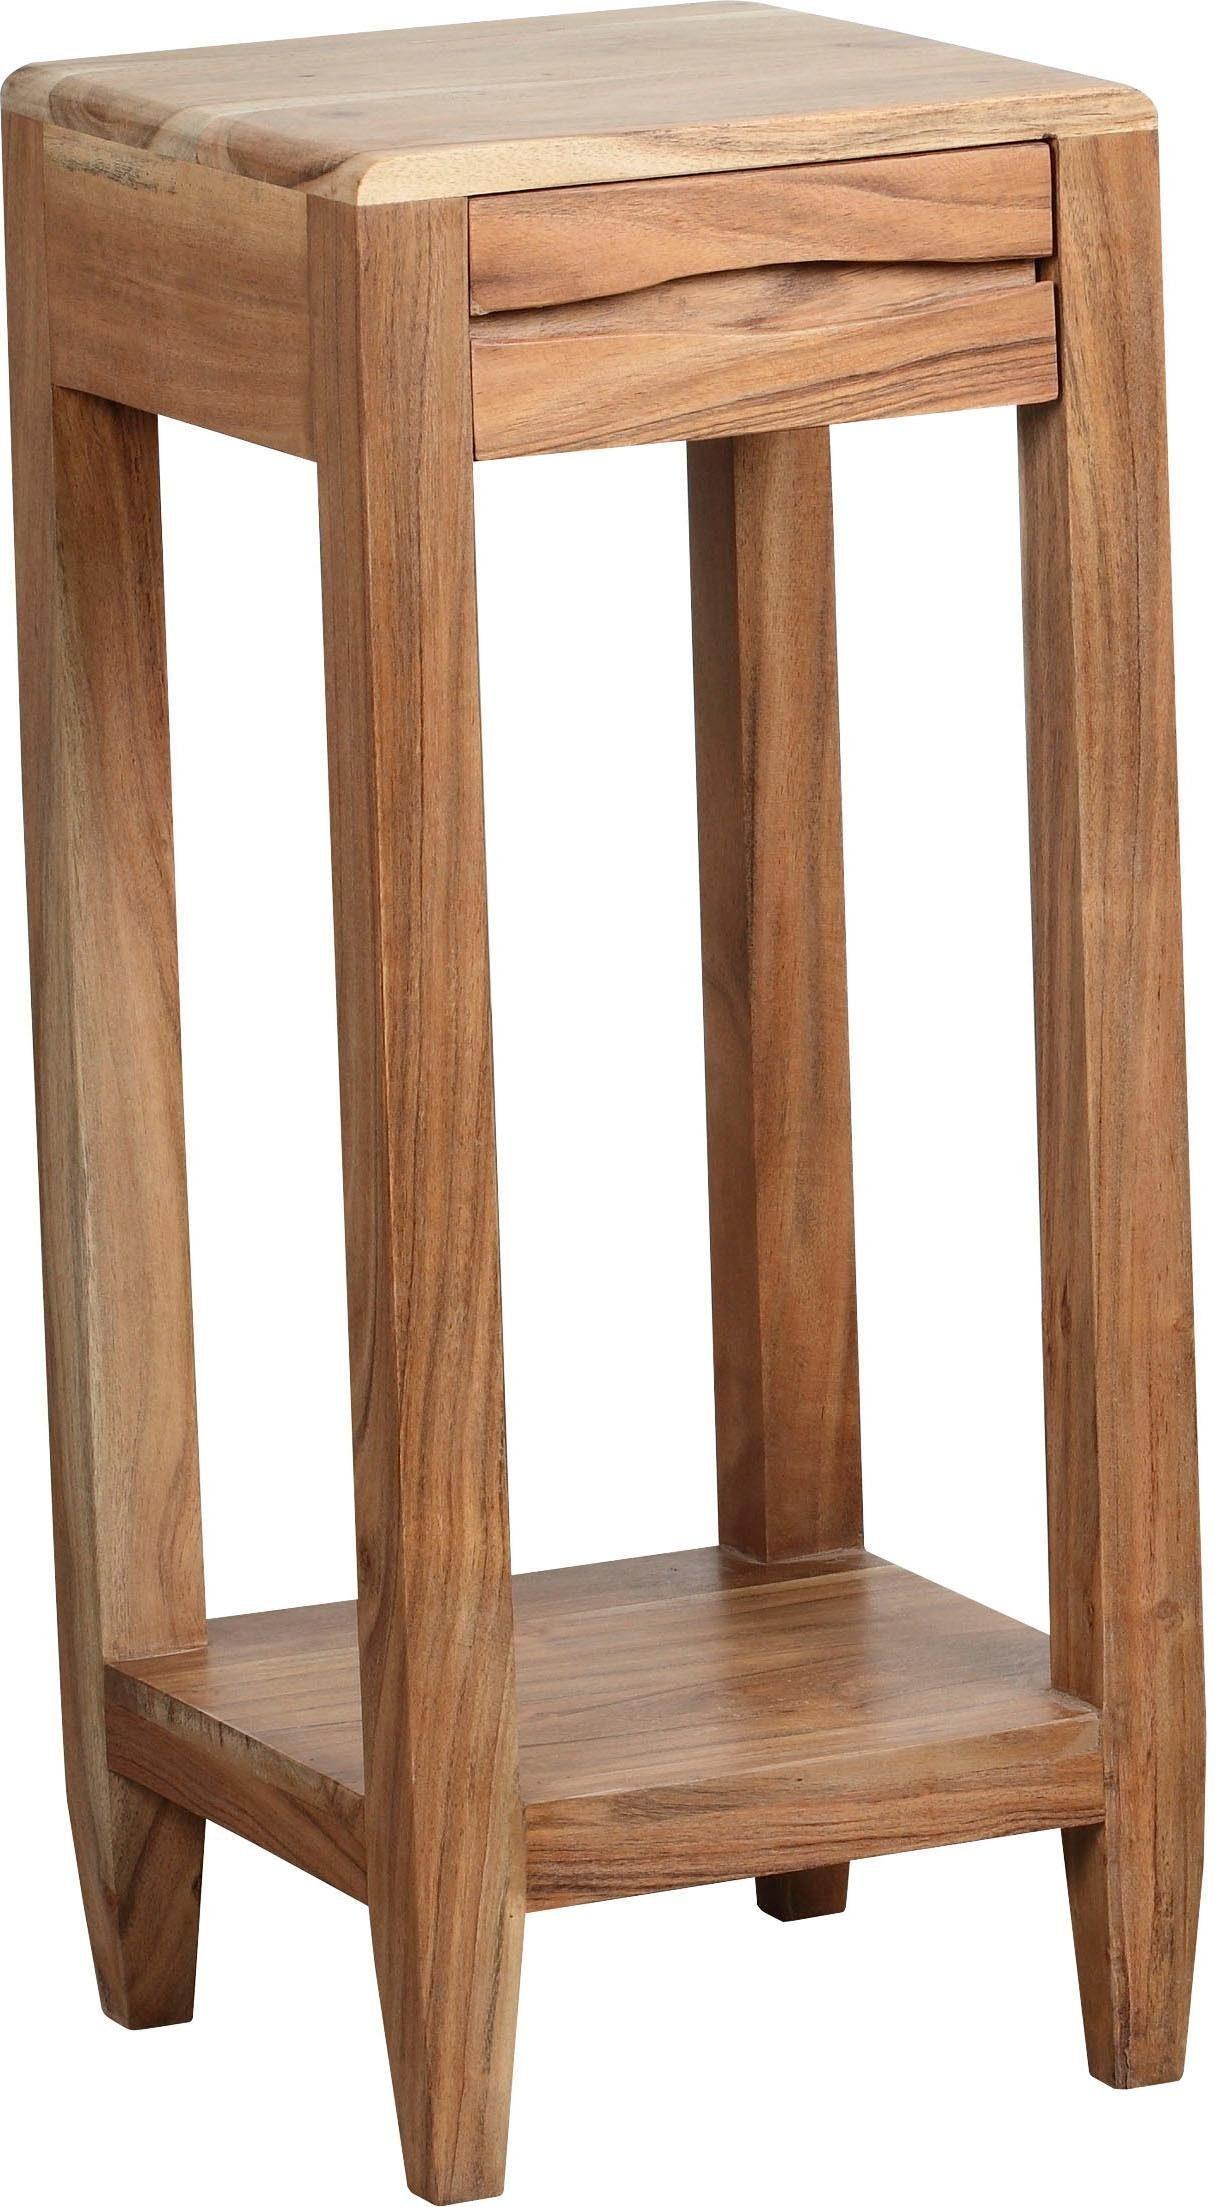 The Wood Times Beistelltisch »Venice« aus Massivholz Akazie